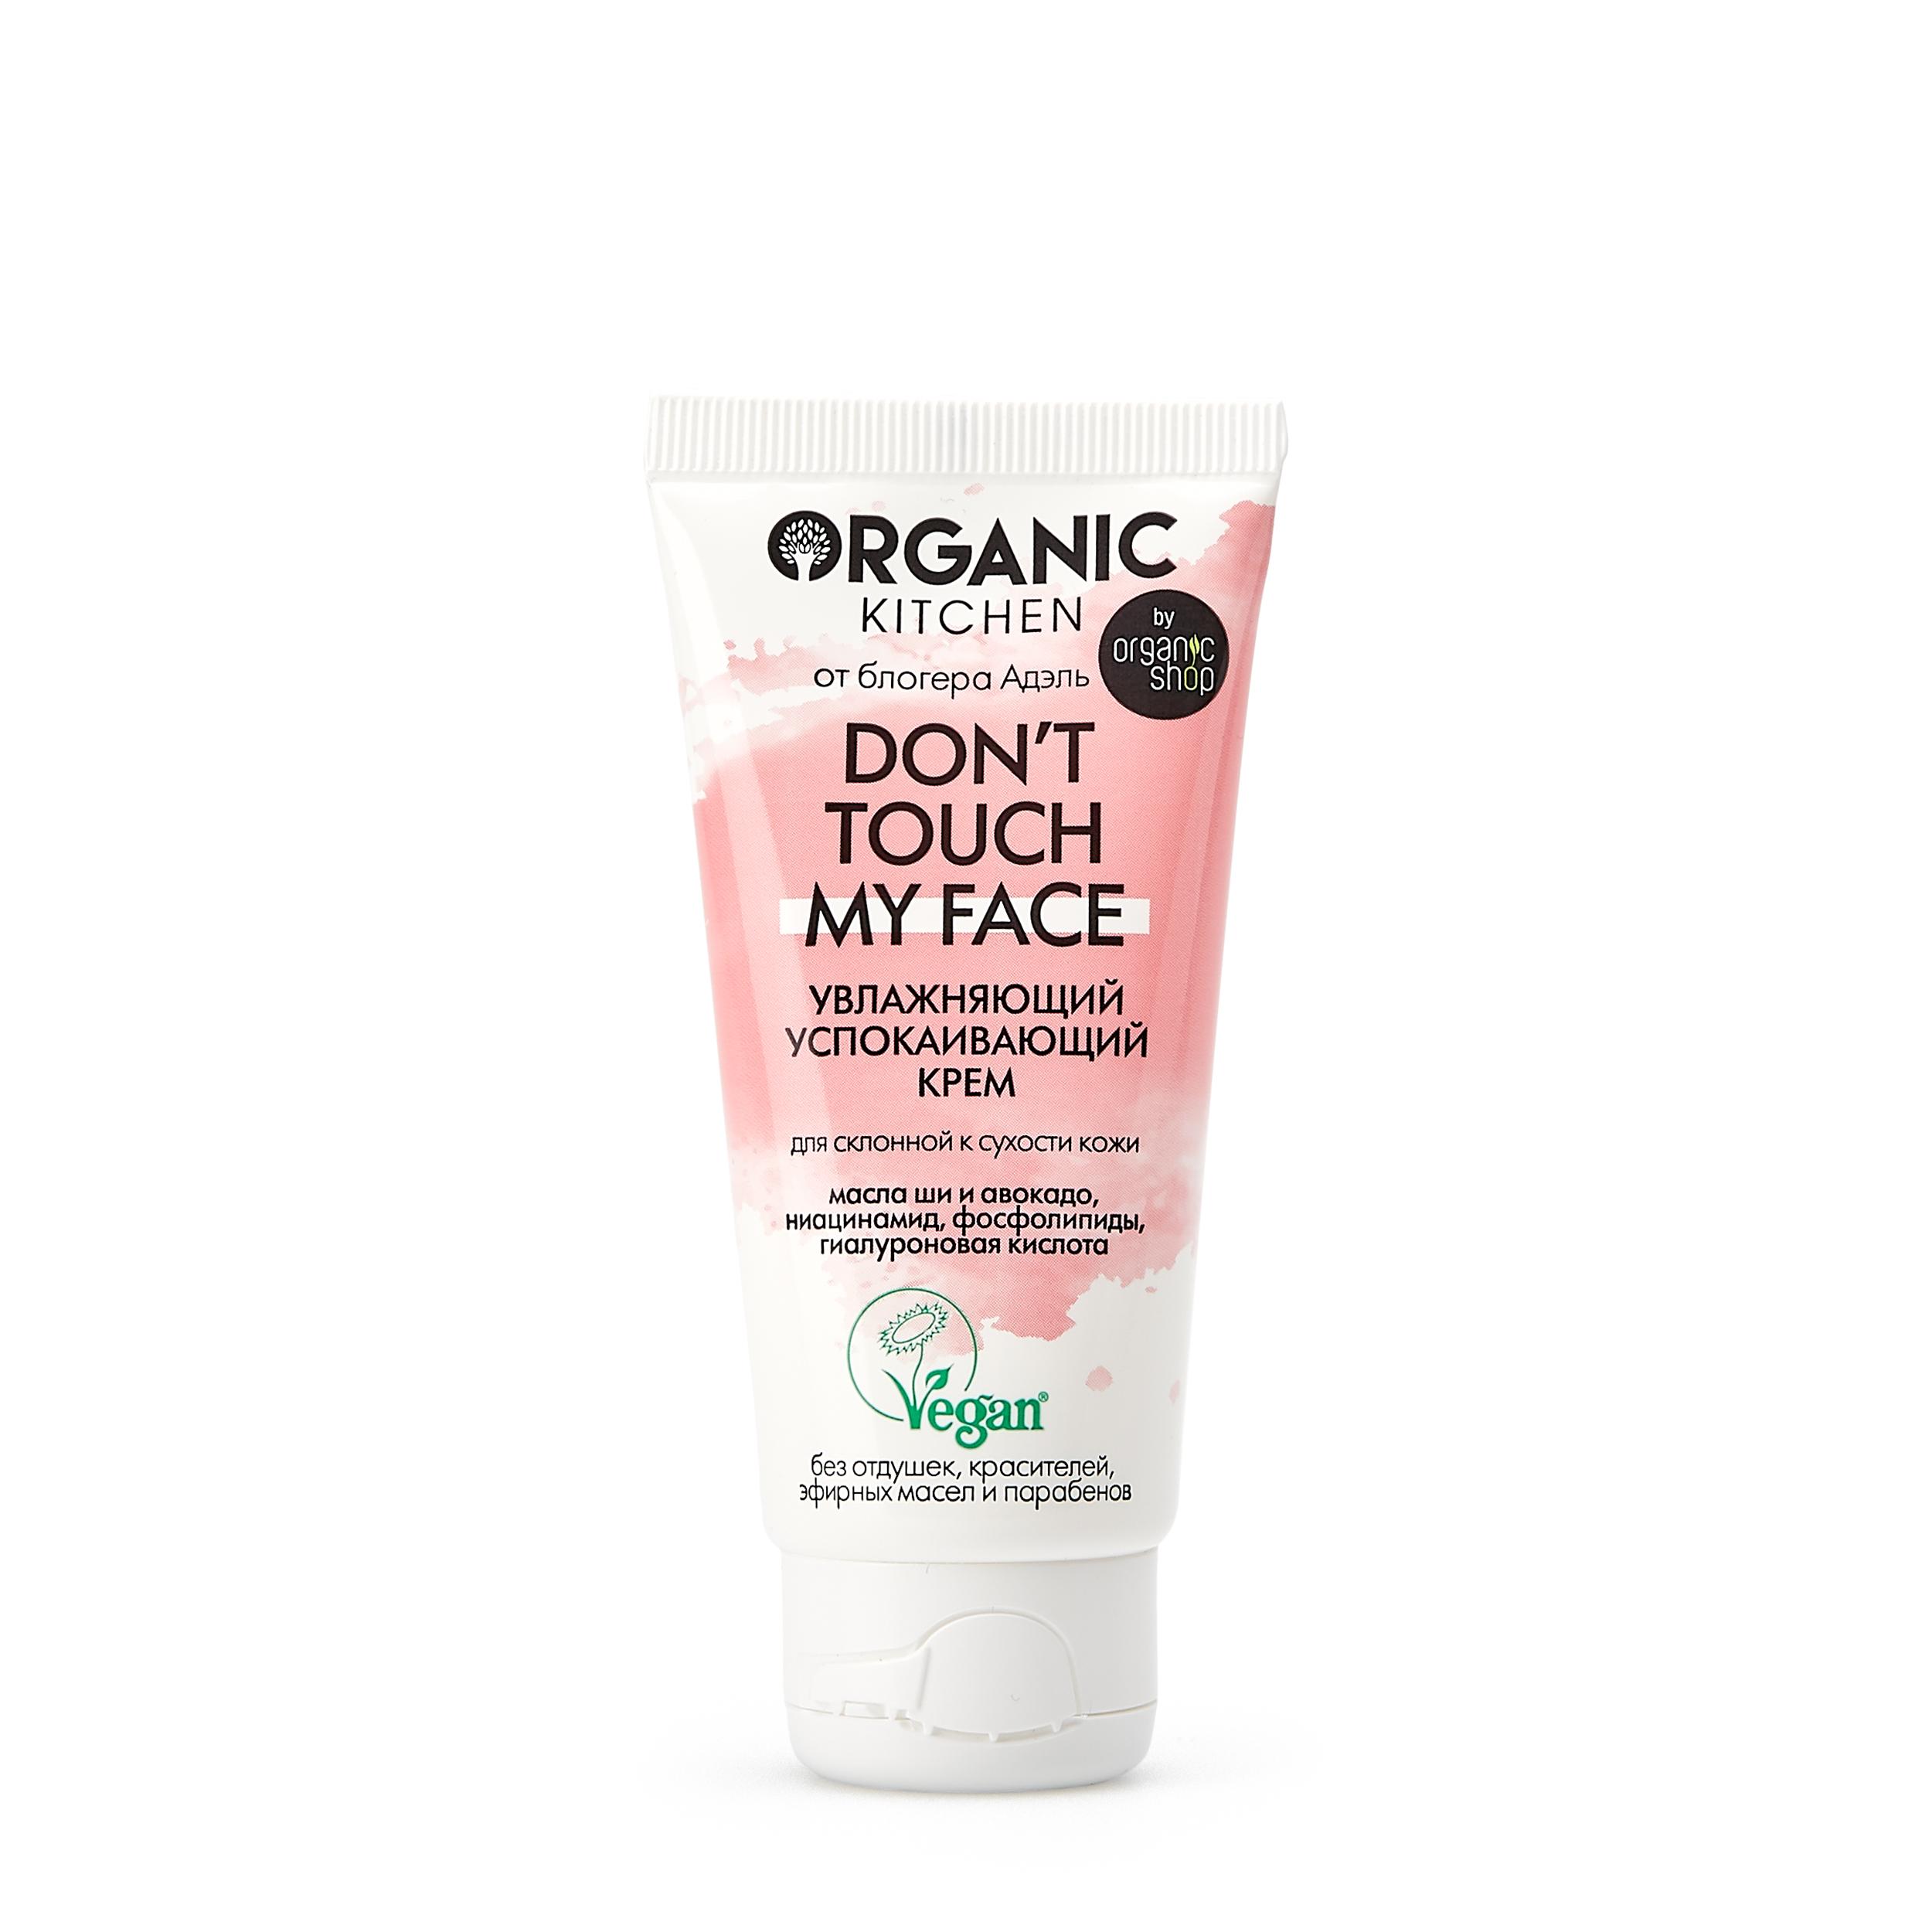 Organic Kitchen Увлажняющий успокаивающий крем «Don't touch my face» 50 мл фото